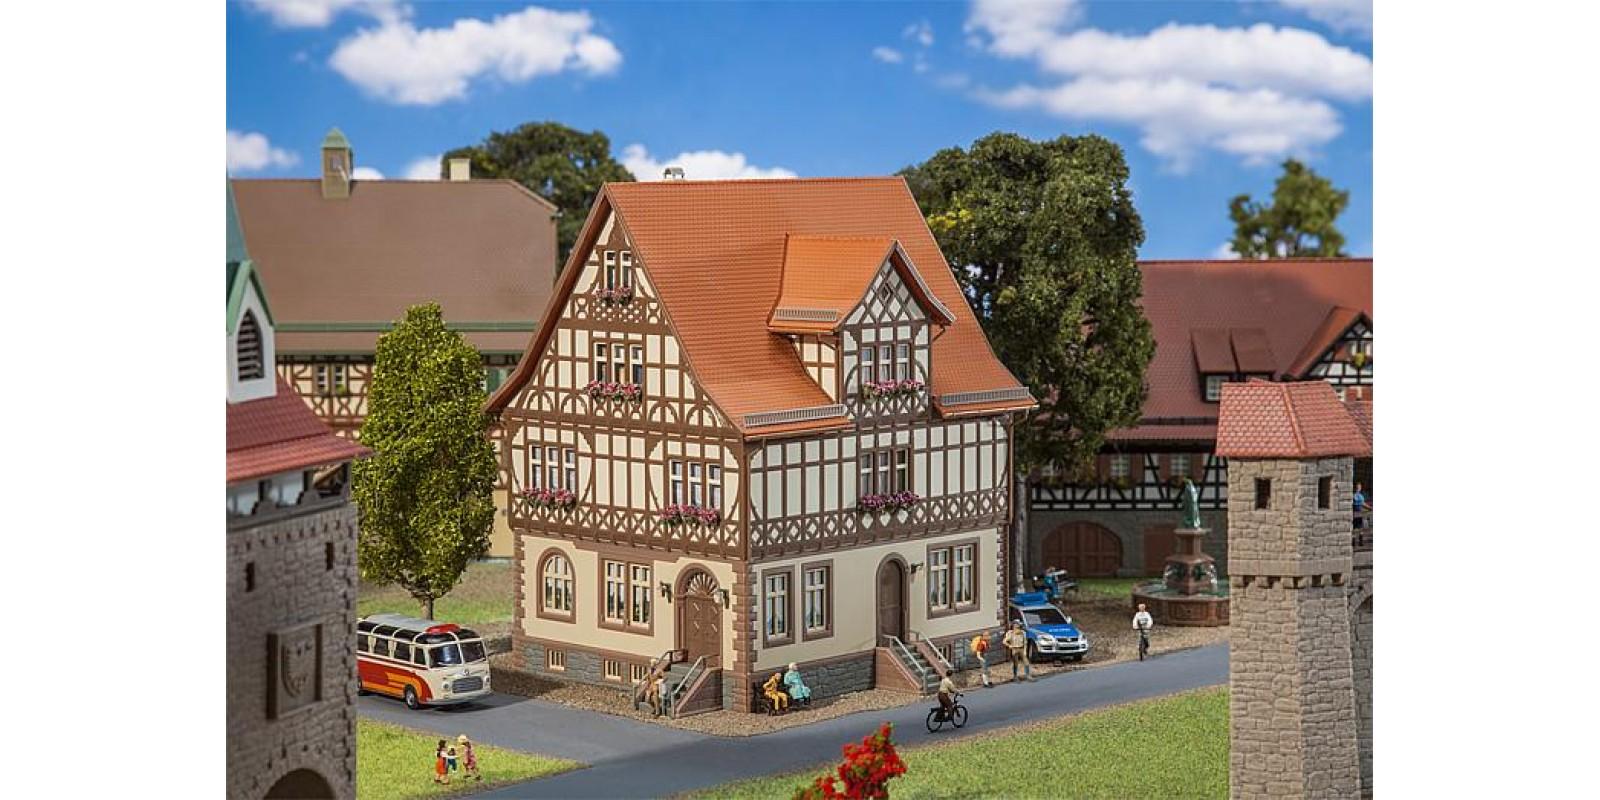 FA191714 Bad Liebenstein Half-timbered house